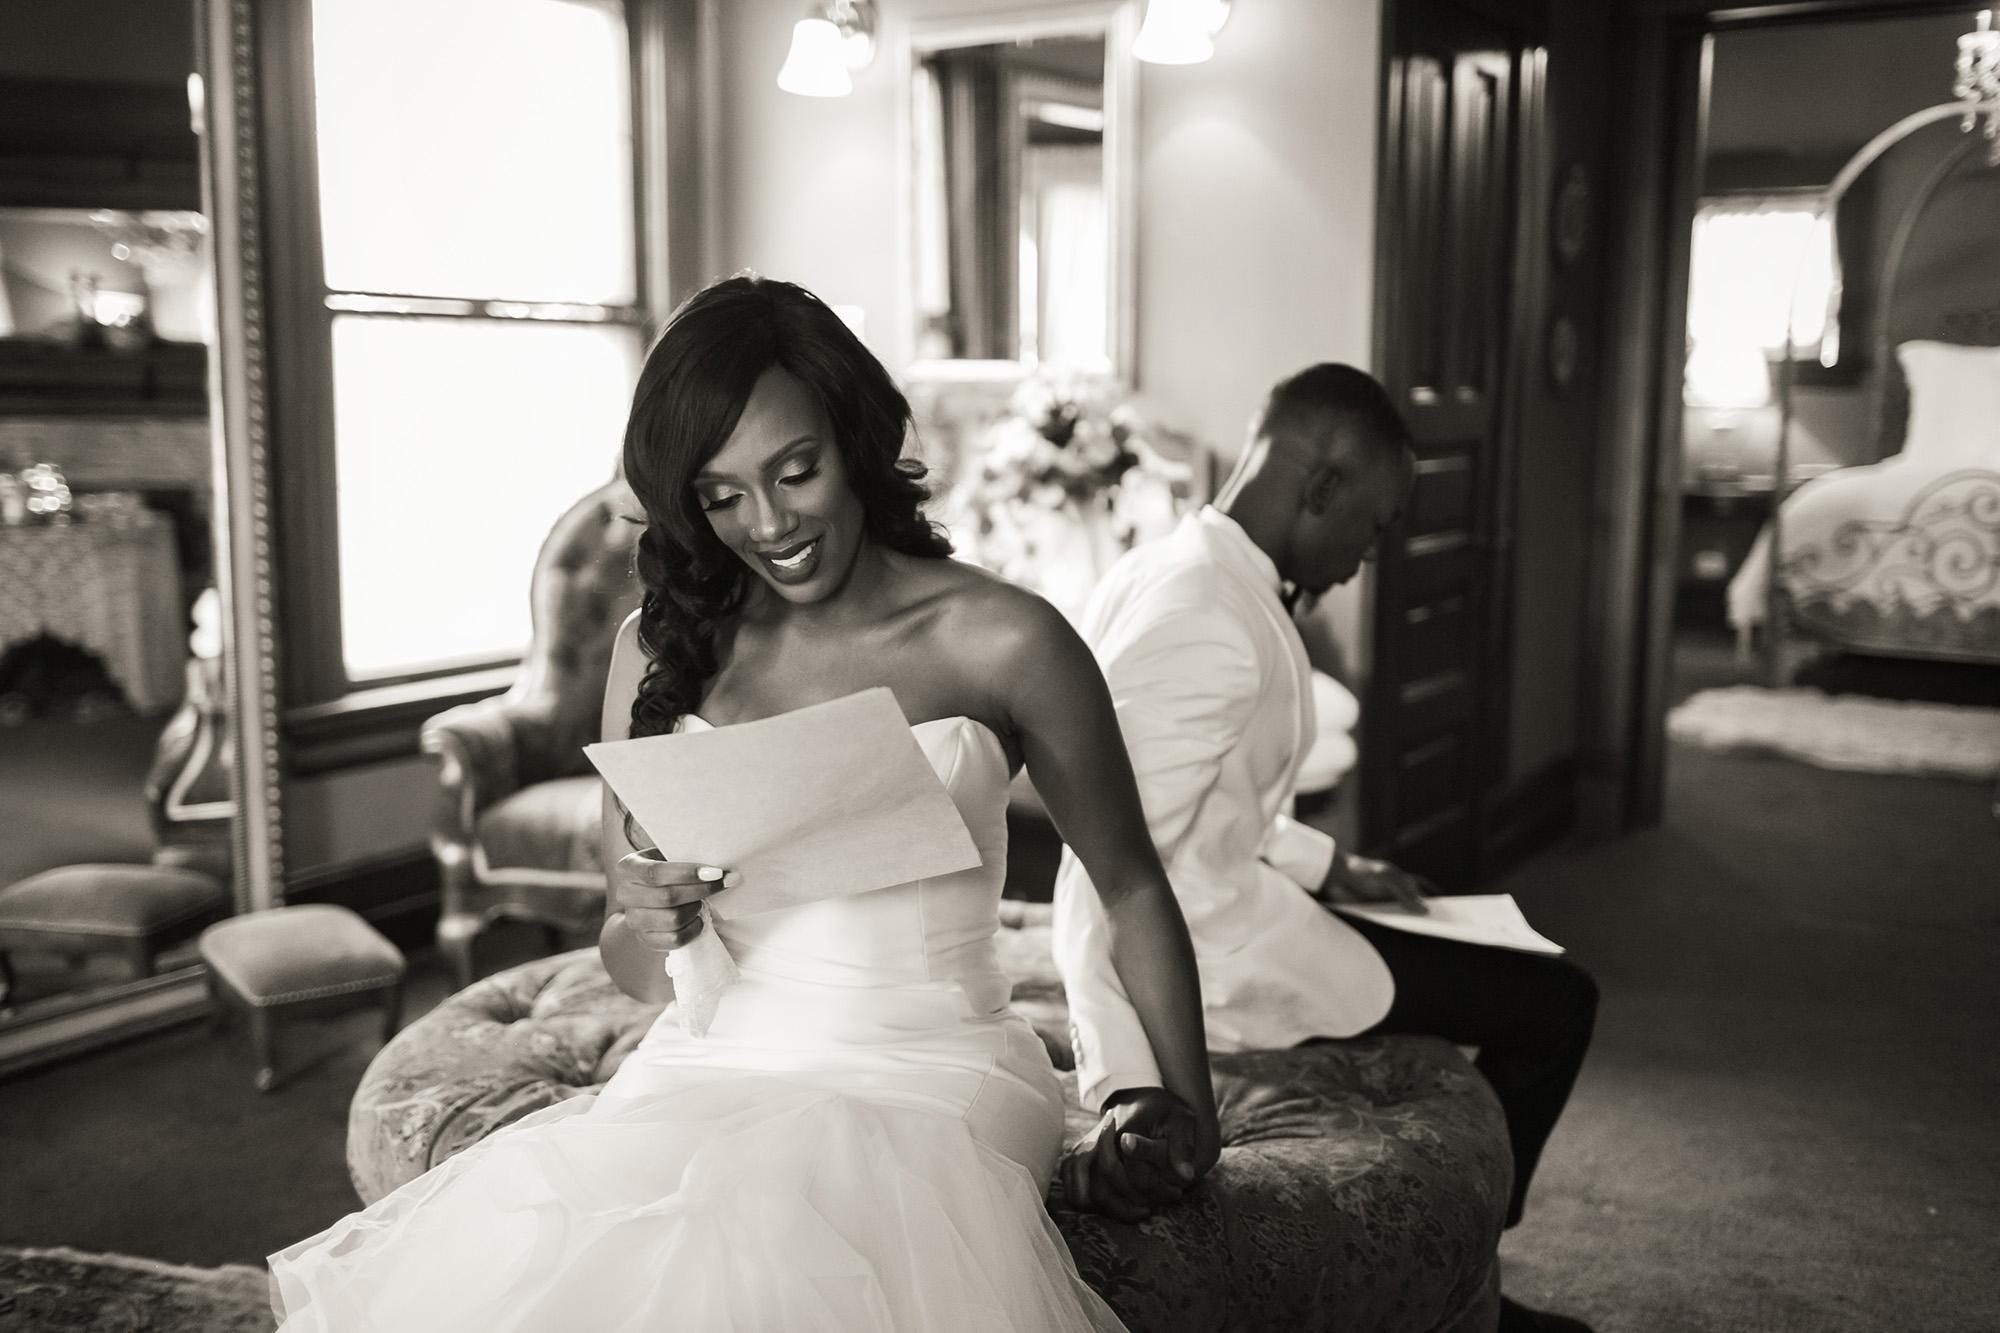 associate-photographer-christmas-house-wedding-carrie-vines-0143.jpg